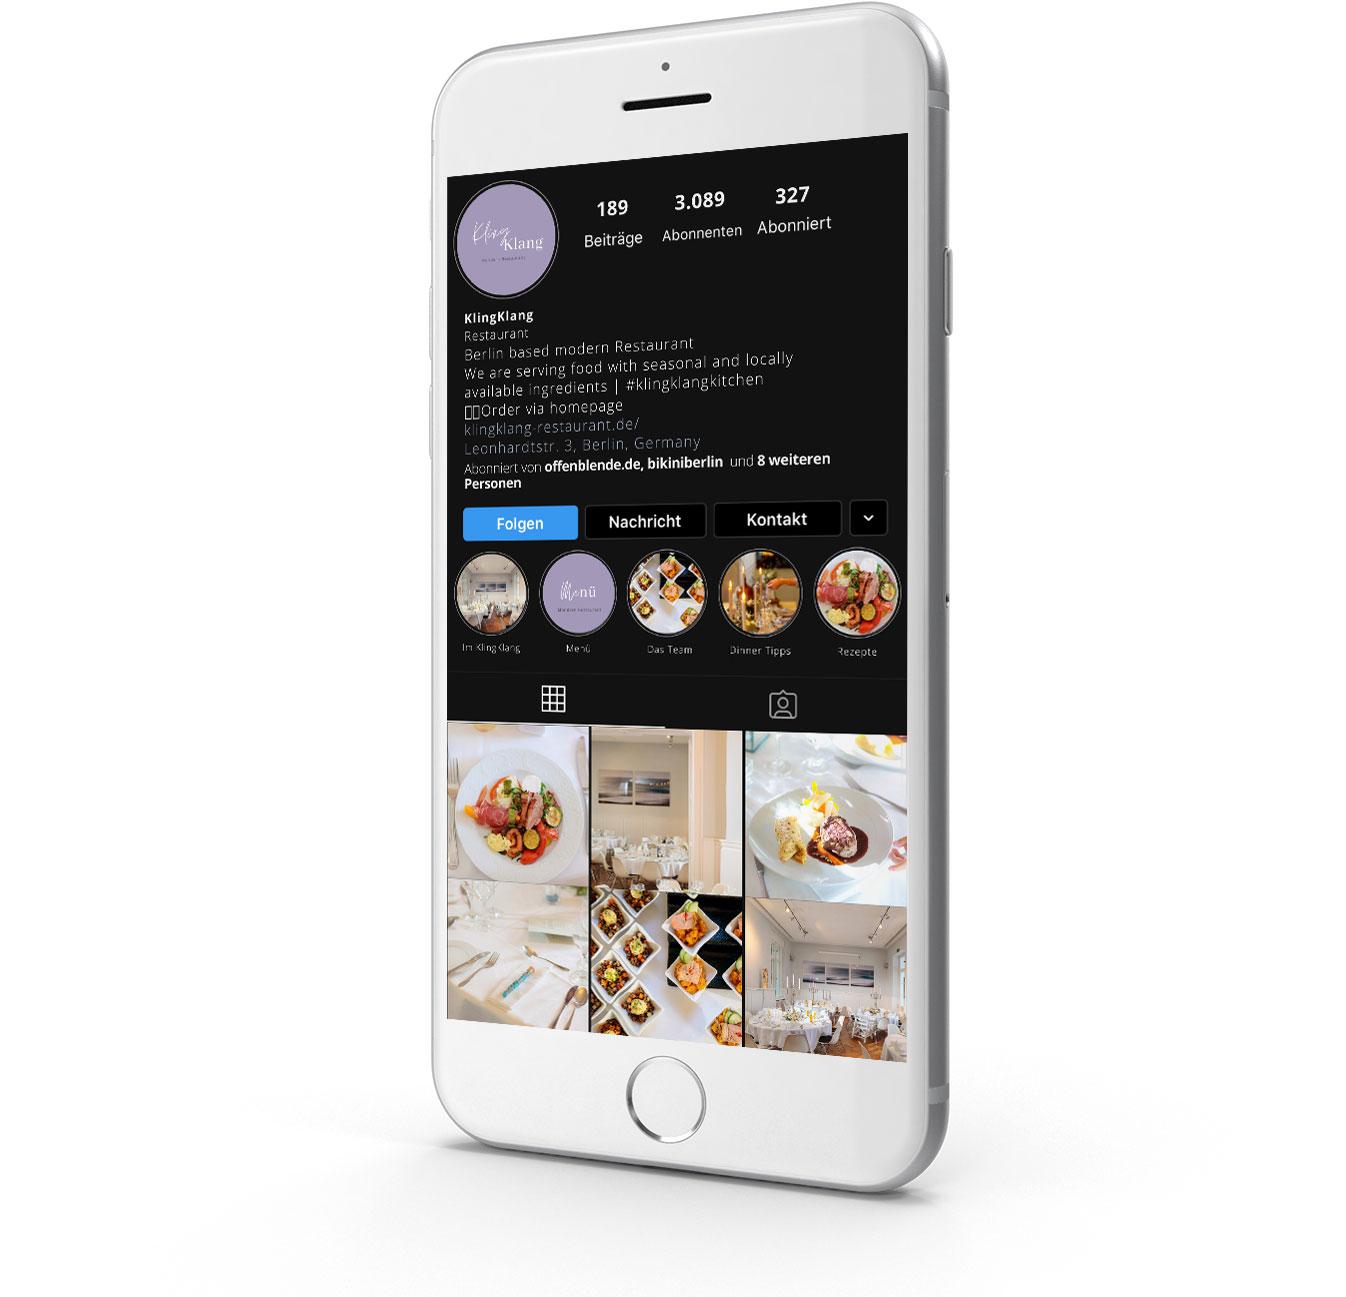 Food Fotograf für Social Media